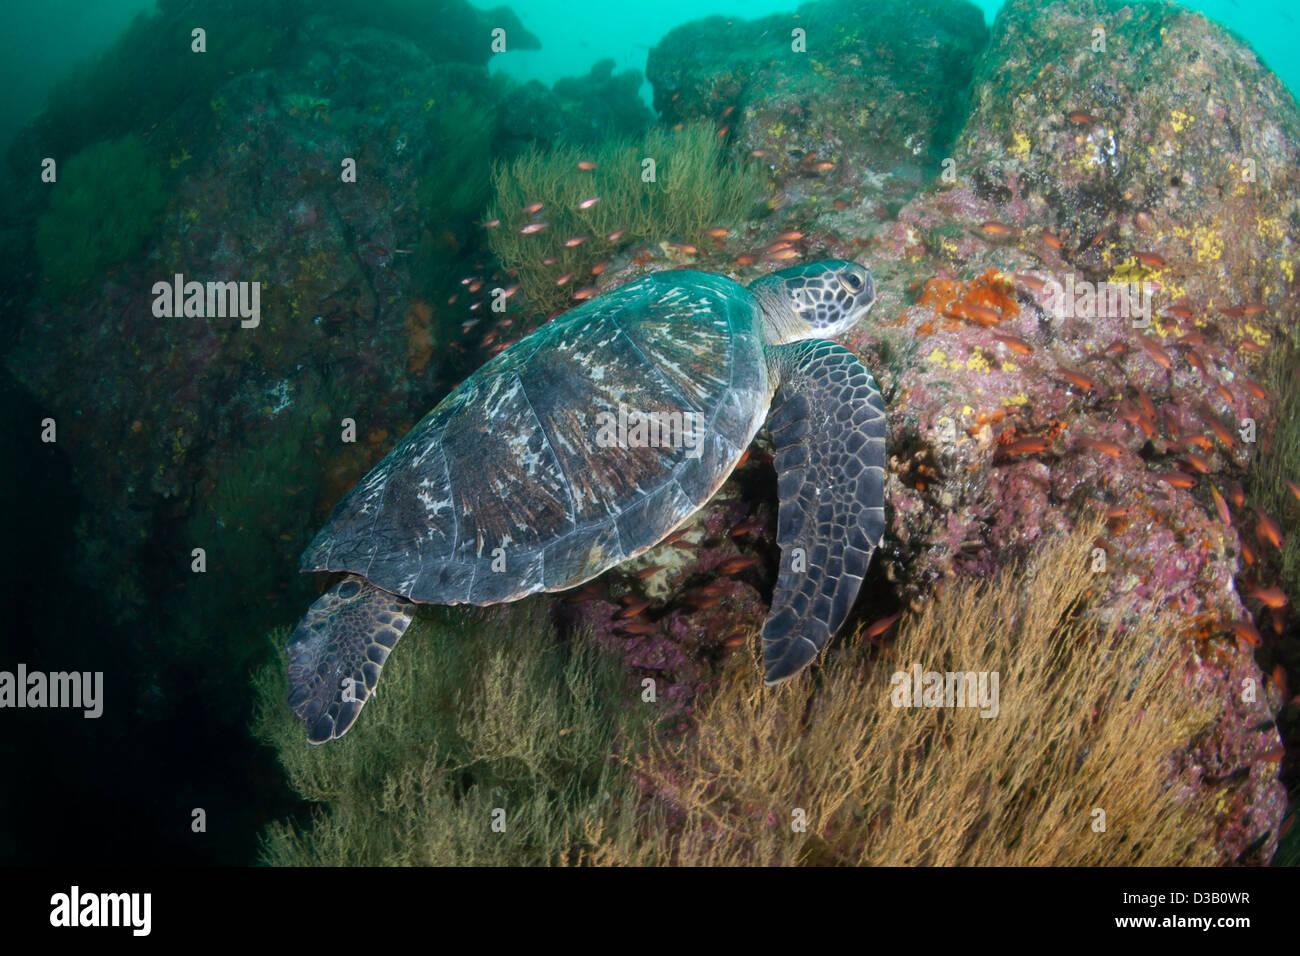 An endangered species, green sea turtle, Chelonia mydas, at Gordon Rocks, Galapagos Archipelago, Ecuador. - Stock Image